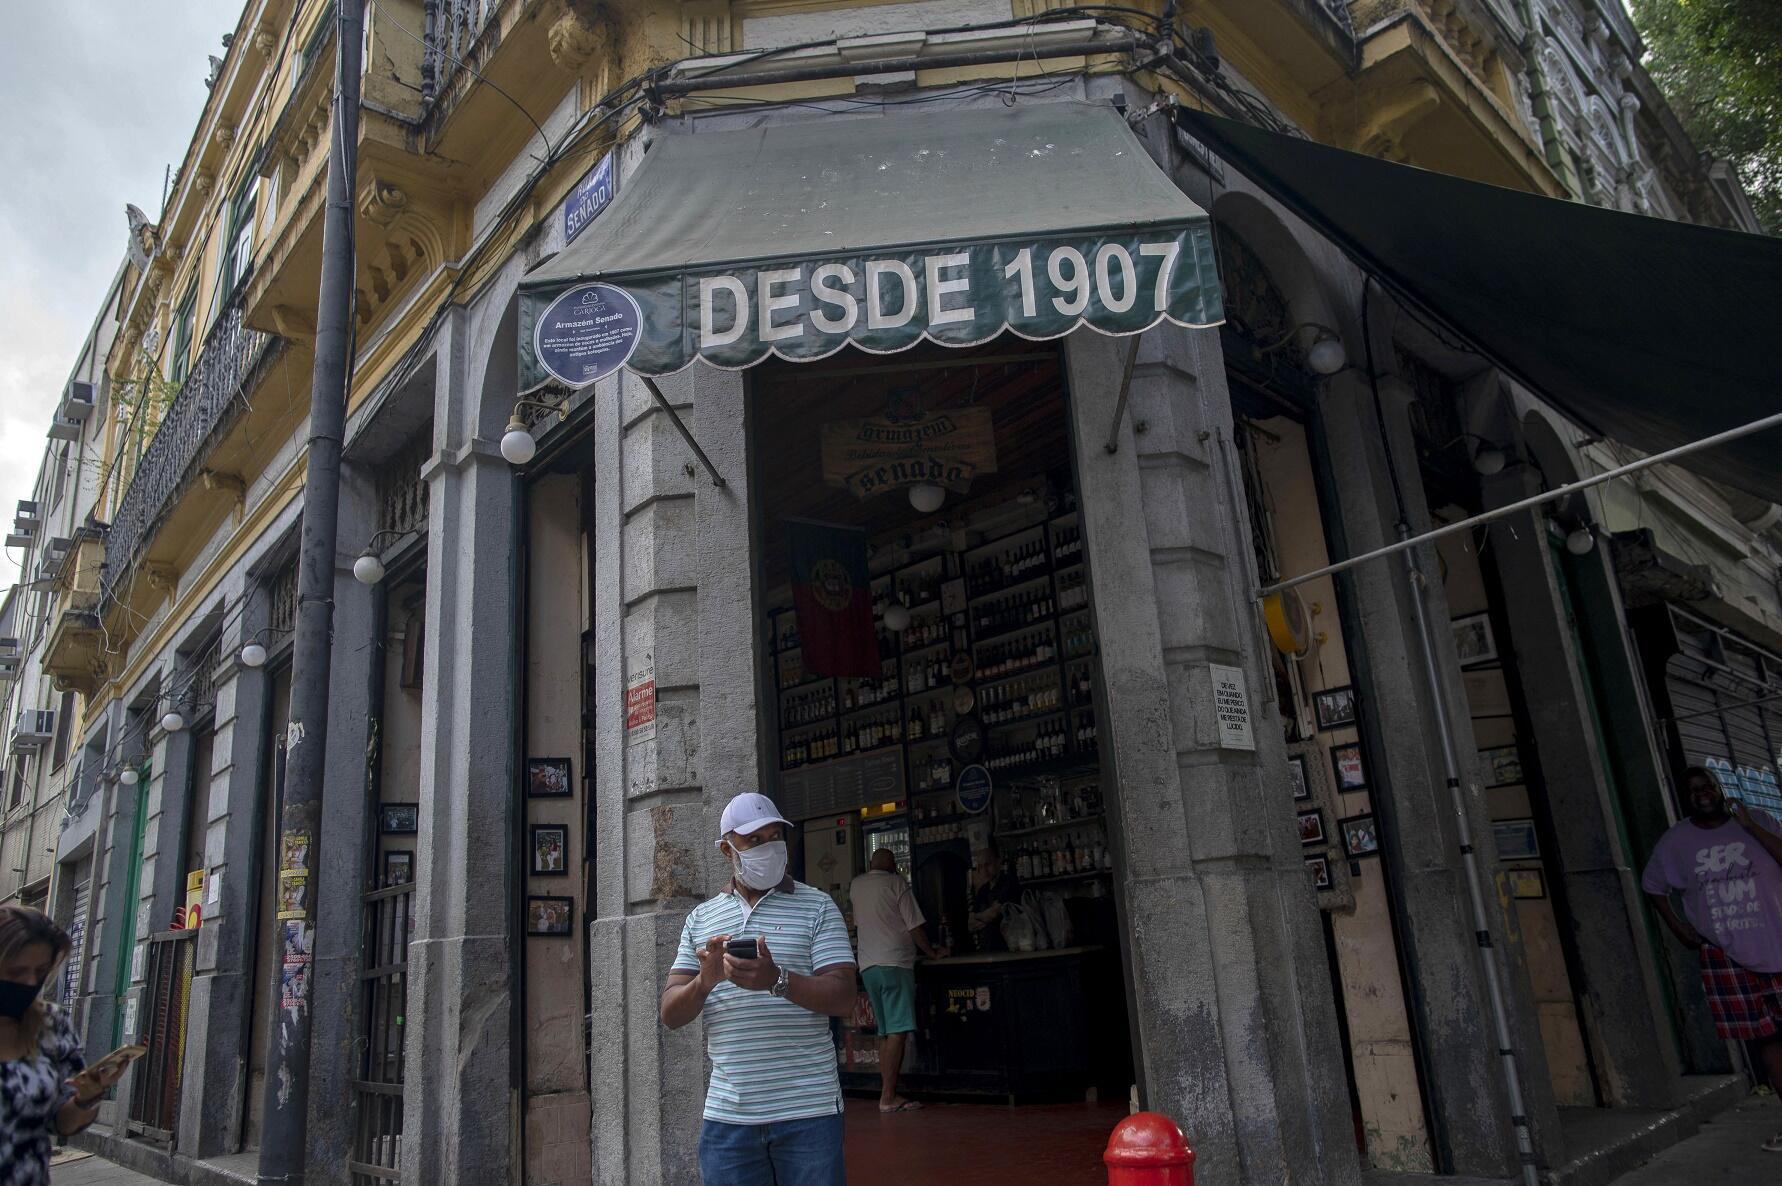 法廣存檔圖片 - Image d'archive RFI: Personne portant un masque dans une rue de Rio, au Brésil.